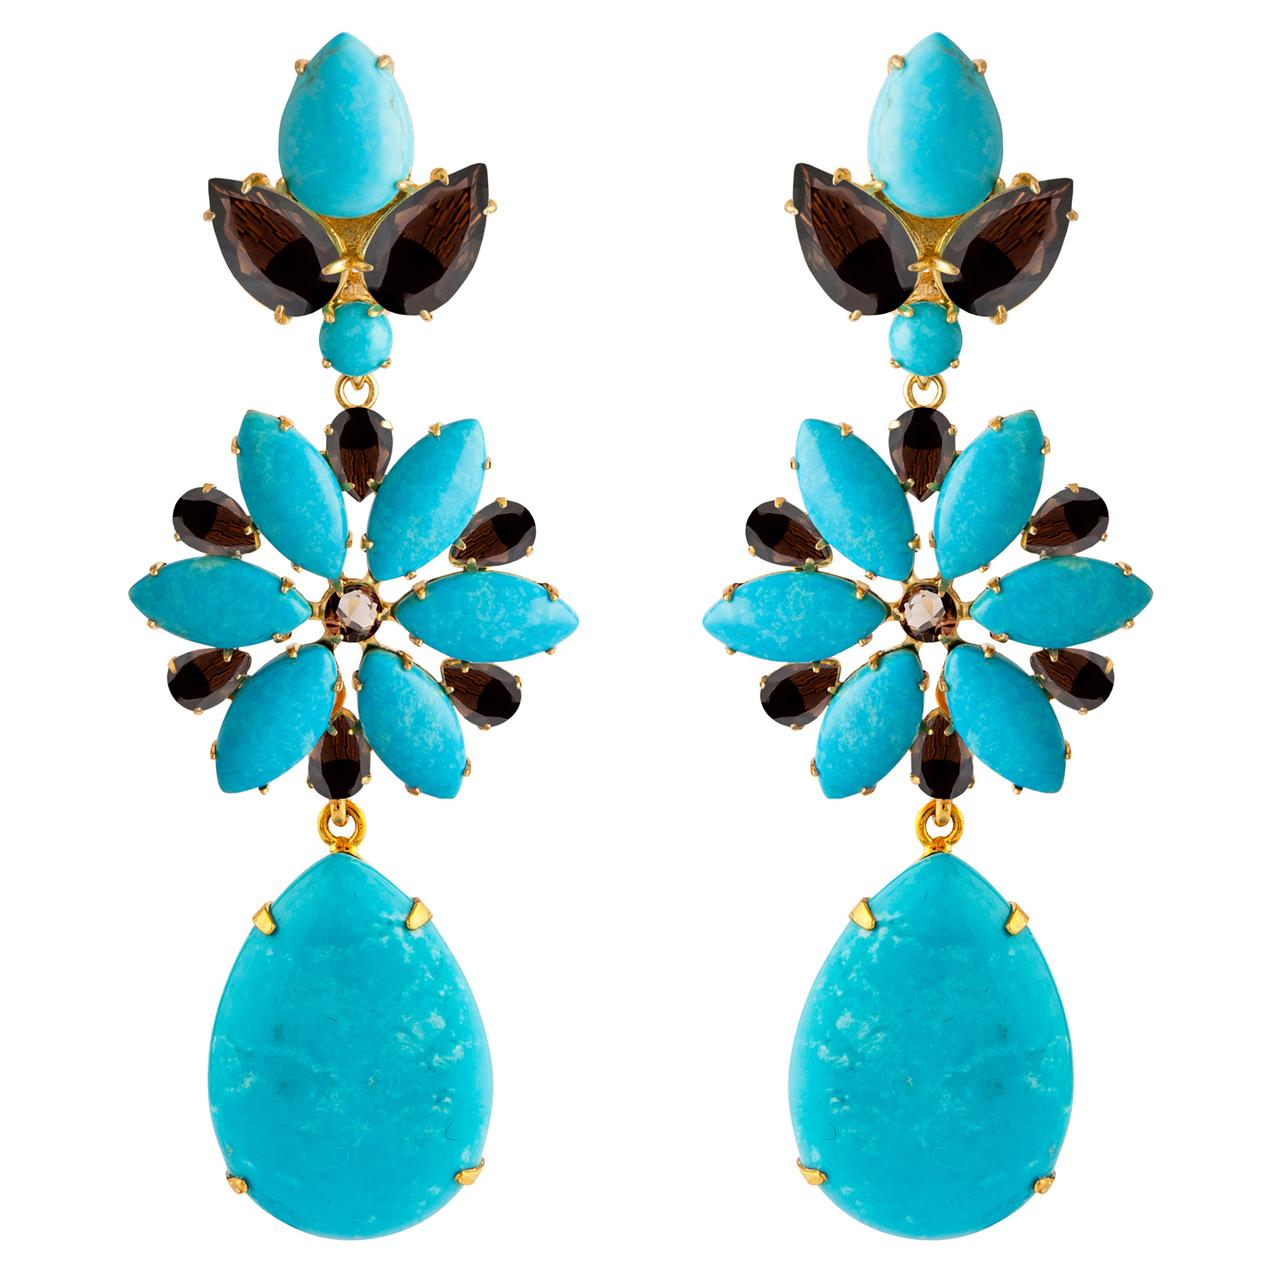 Turquoise Smoky Quartz Earrings by BOUNKIT